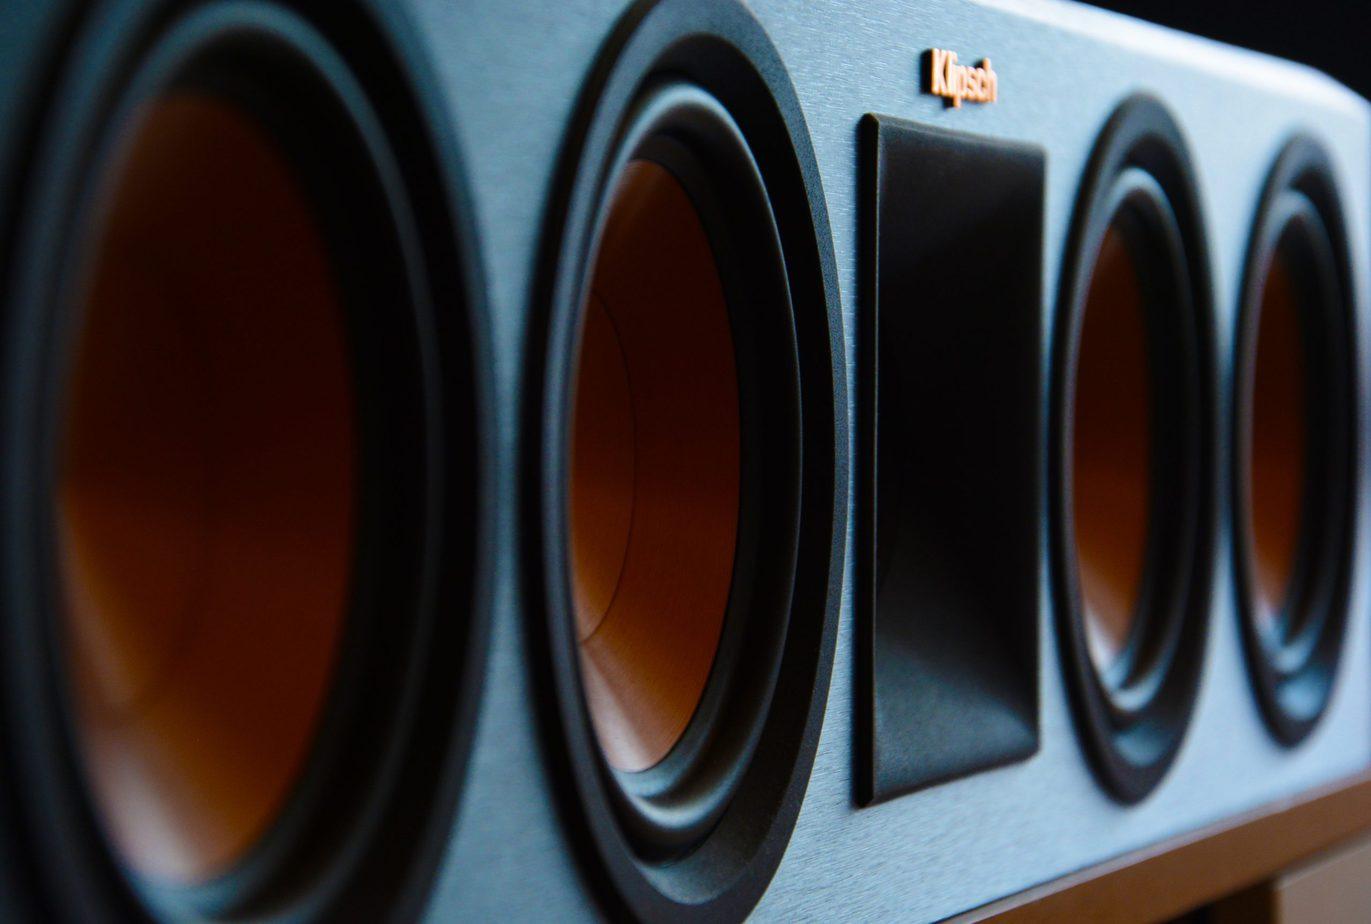 4 Driver Center Channel Speaker Up Close